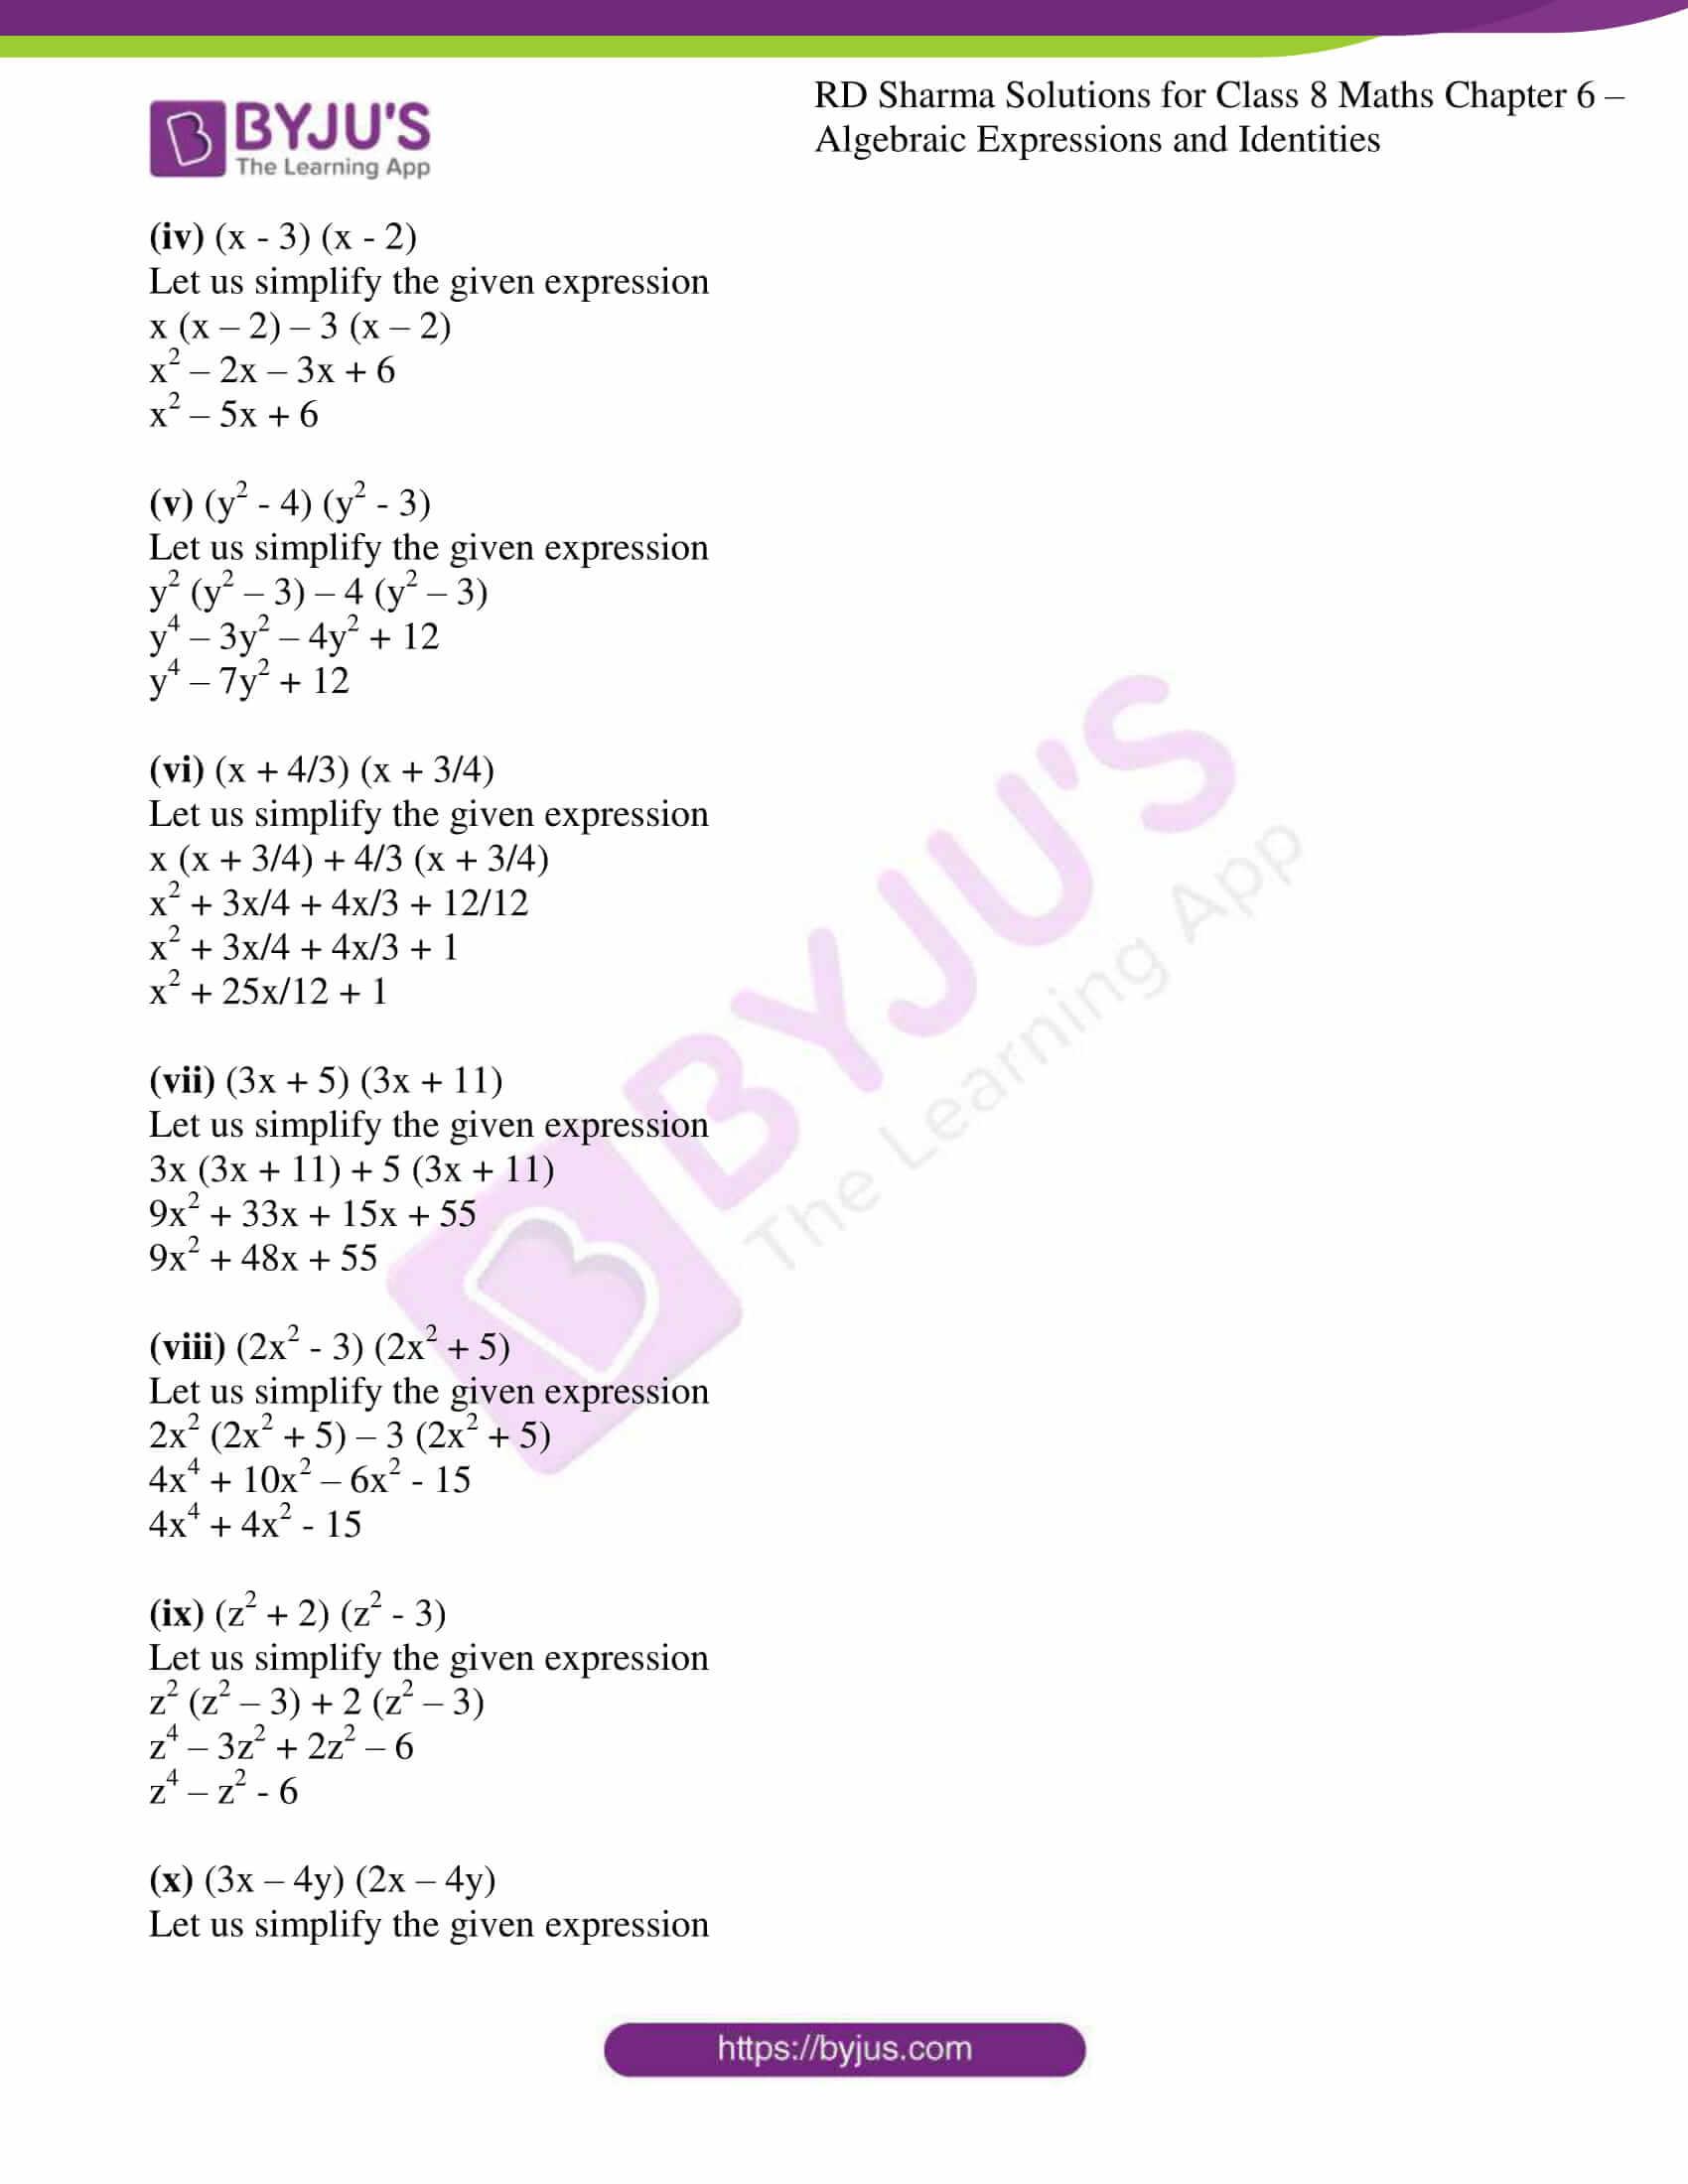 rd sharma class 8 maths chapter 6 exercise 7 2